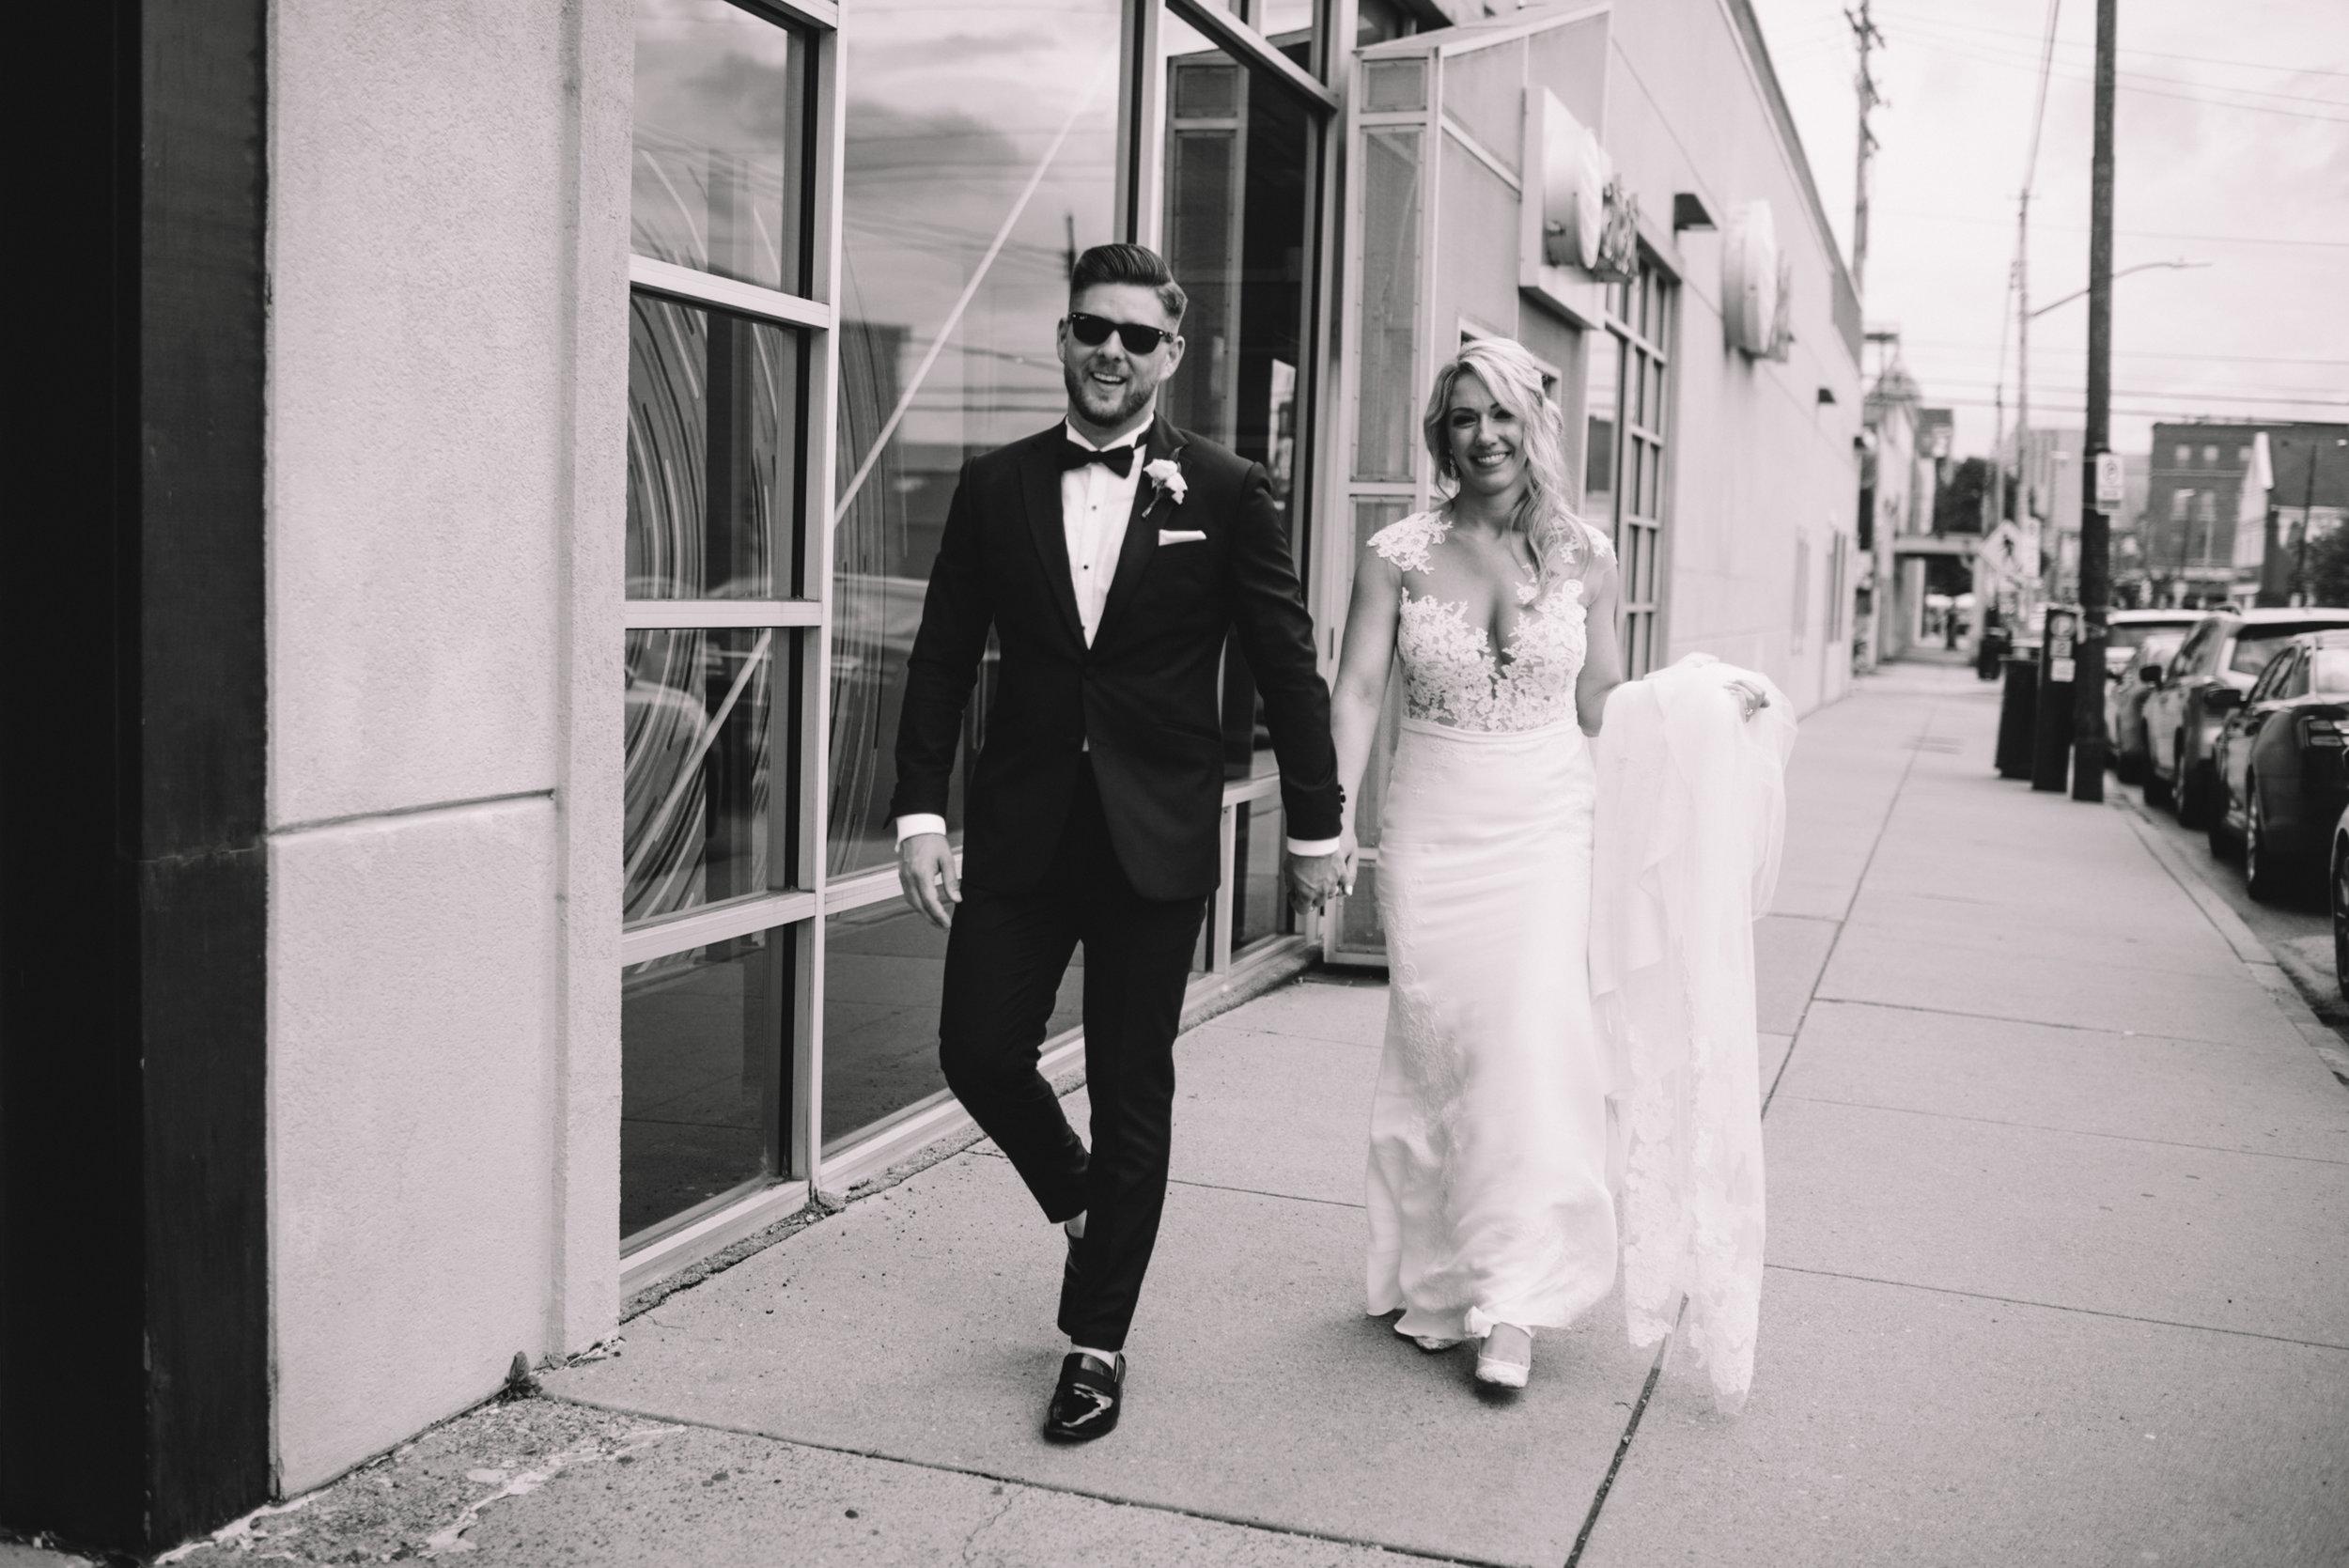 Pittsburgh Pennsylvania New York NYC Wedding Photographer Photojournalist Luxury Downtown Opera - Stirpe 1111.jpg